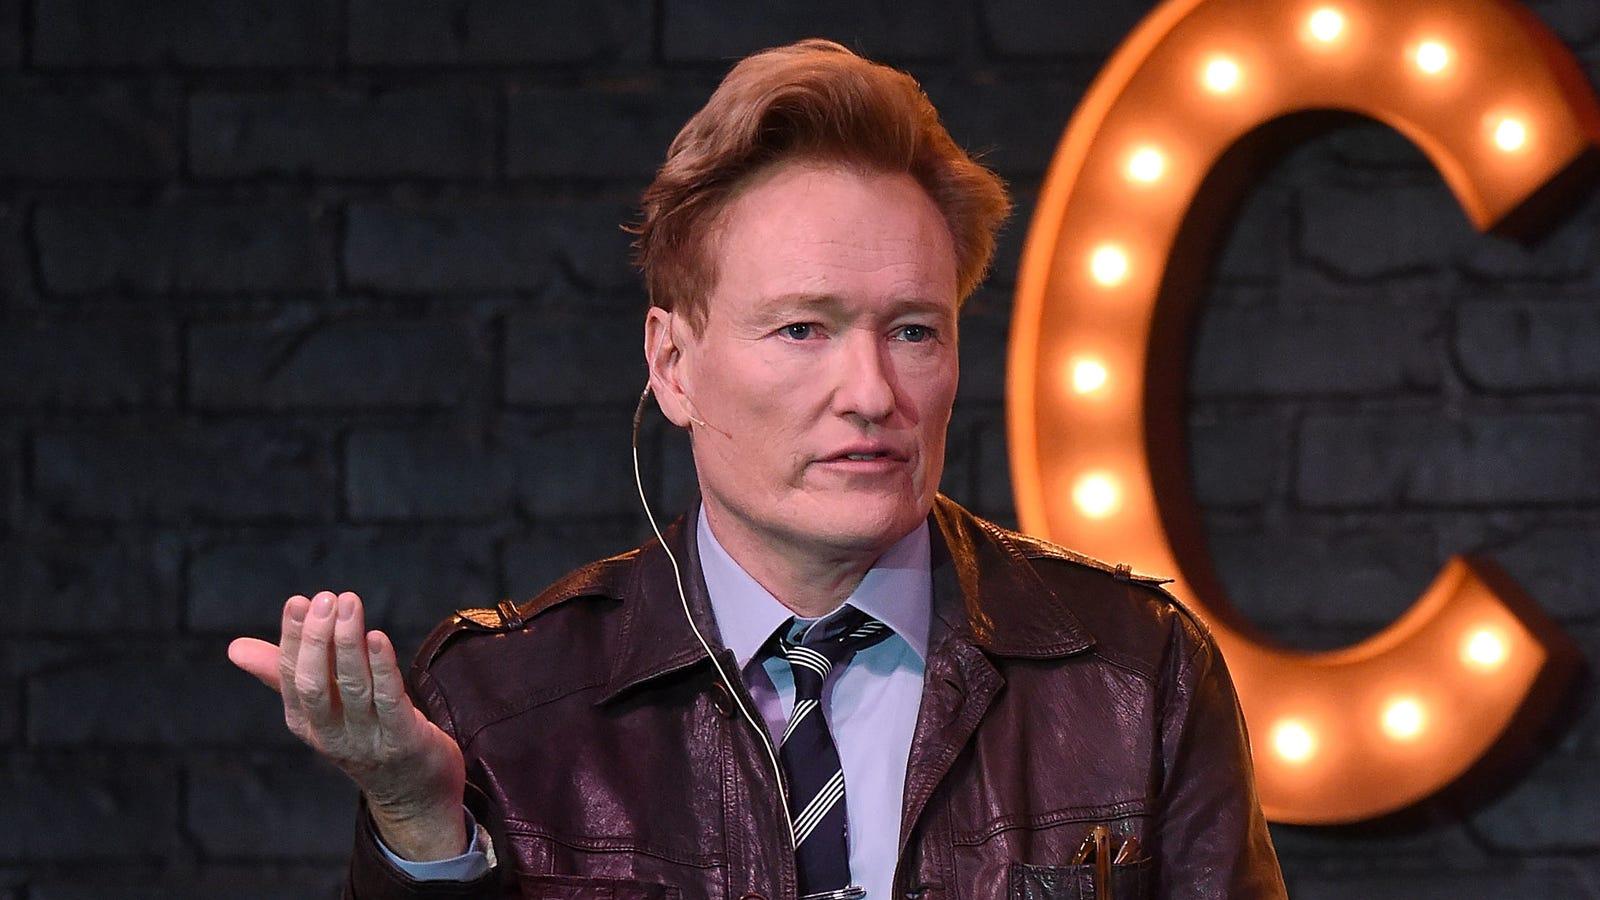 Conan O'Brien settles joke-theft lawsuit, shares essay explaining why - The A.V. Club